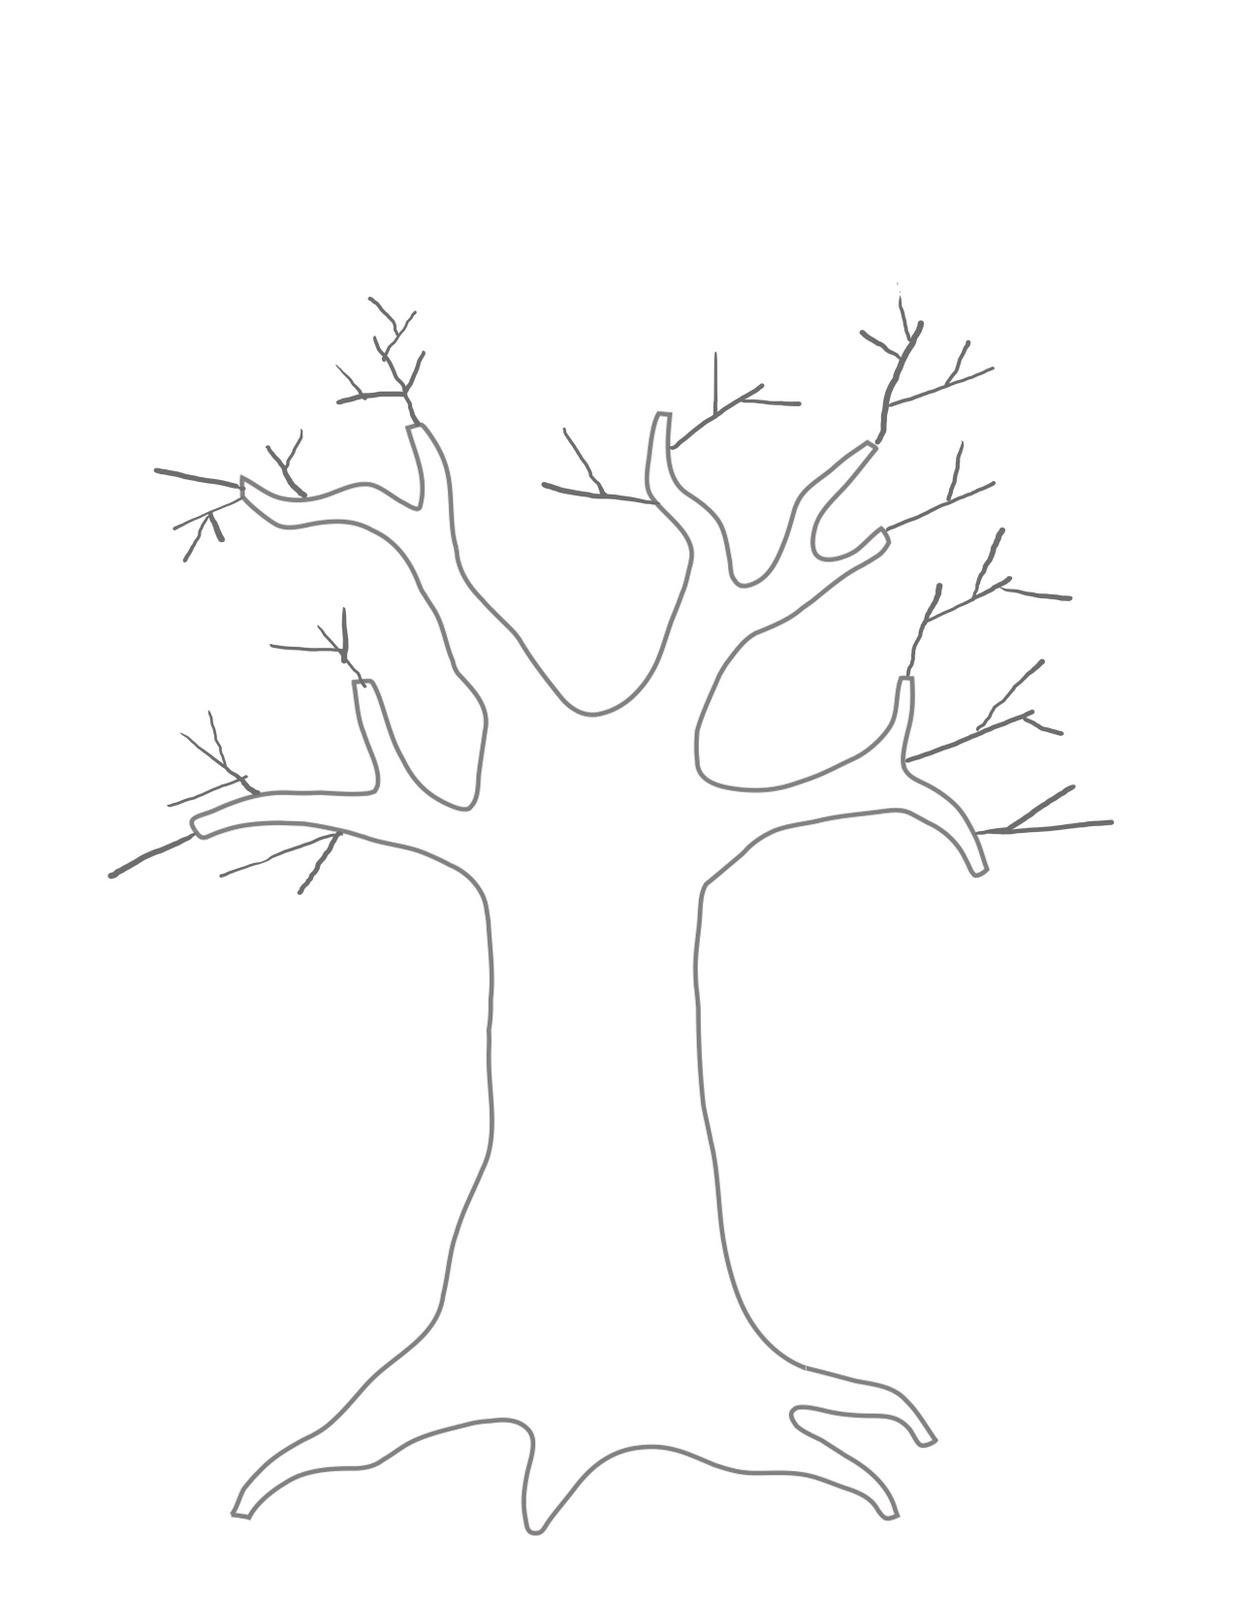 Tree Trunk Drawing At Getdrawings